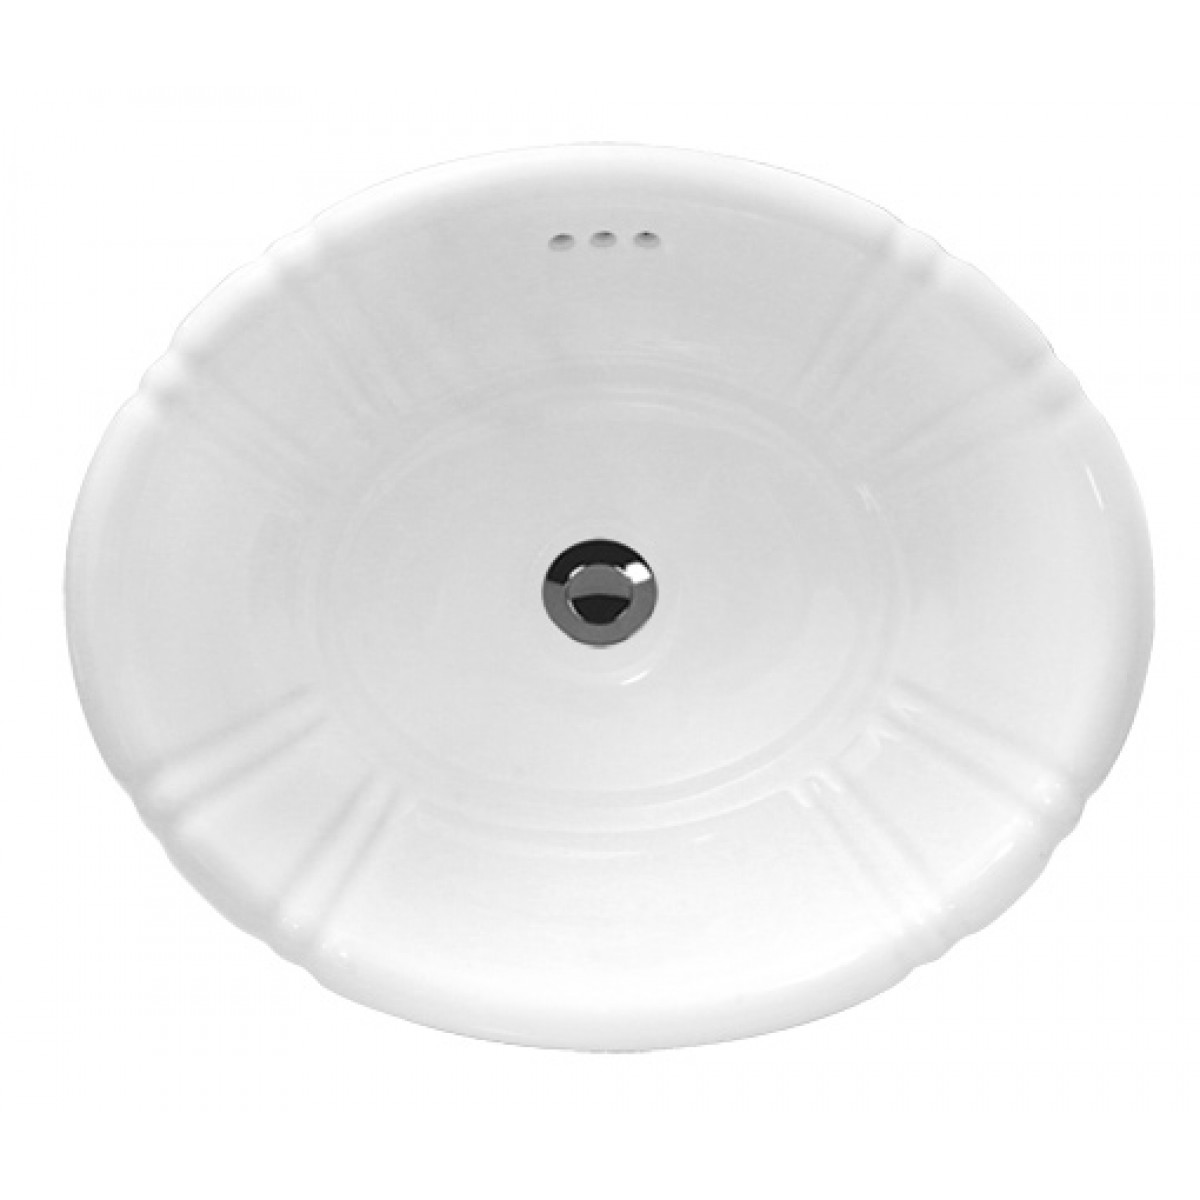 Drop In Vessel Sink : ... Ceramic Vanity Drop In Bathroom Vessel Sink - 18 x 15-1/2 x 6-1/4 Inch